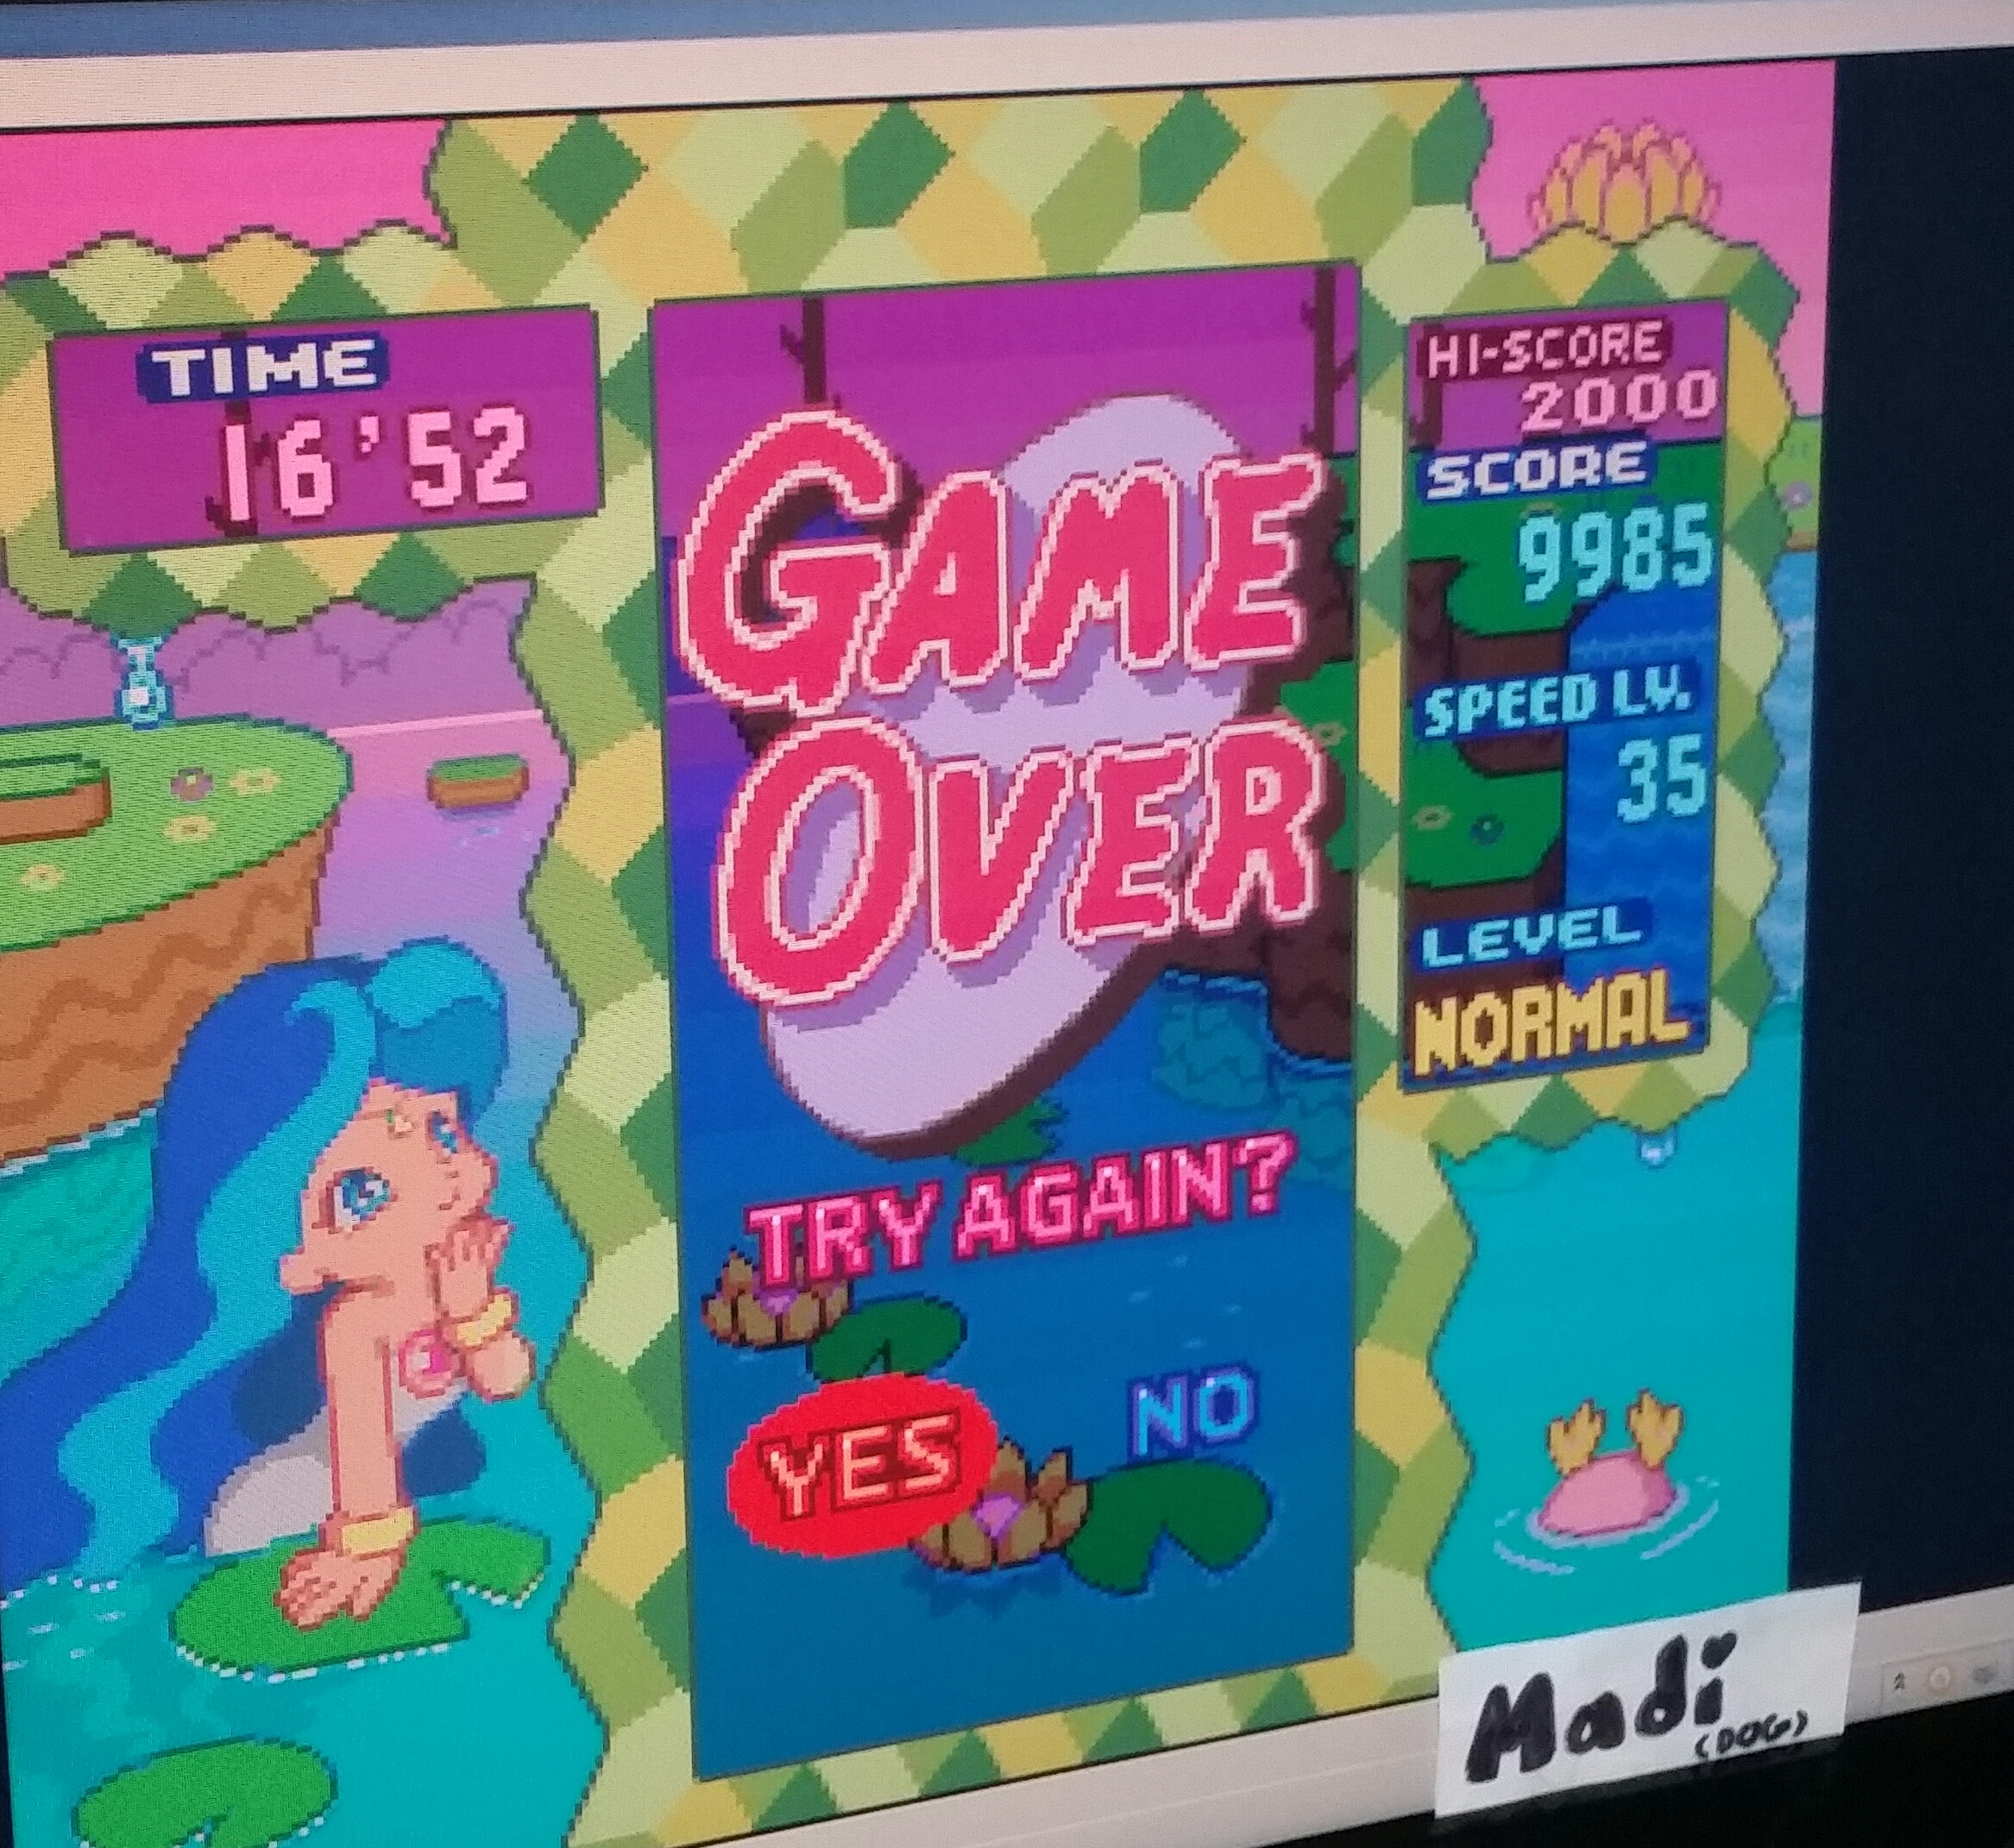 madi: Panel de Pon [Endless/Normal] (SNES/Super Famicom Emulated) 9,985 points on 2016-11-14 17:51:48